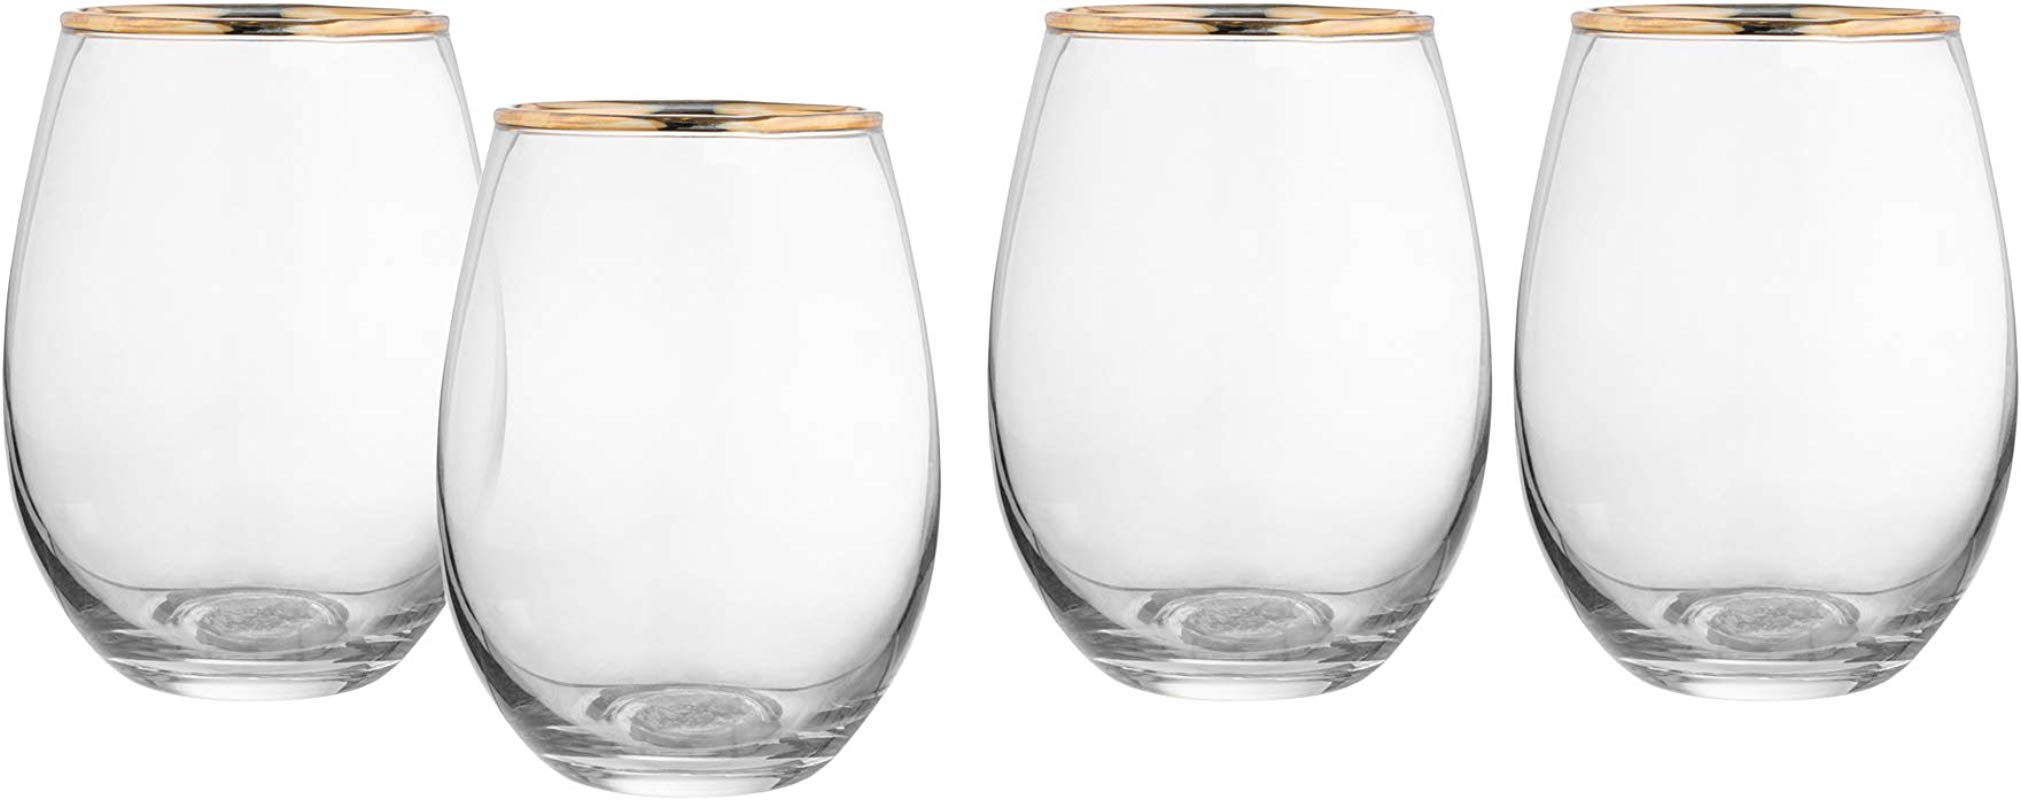 Elle D Cor 229116 4SG Louis Set Of 4 Lead Free Stemless Wine Goblets Glasses 3 5x4 7 Gold